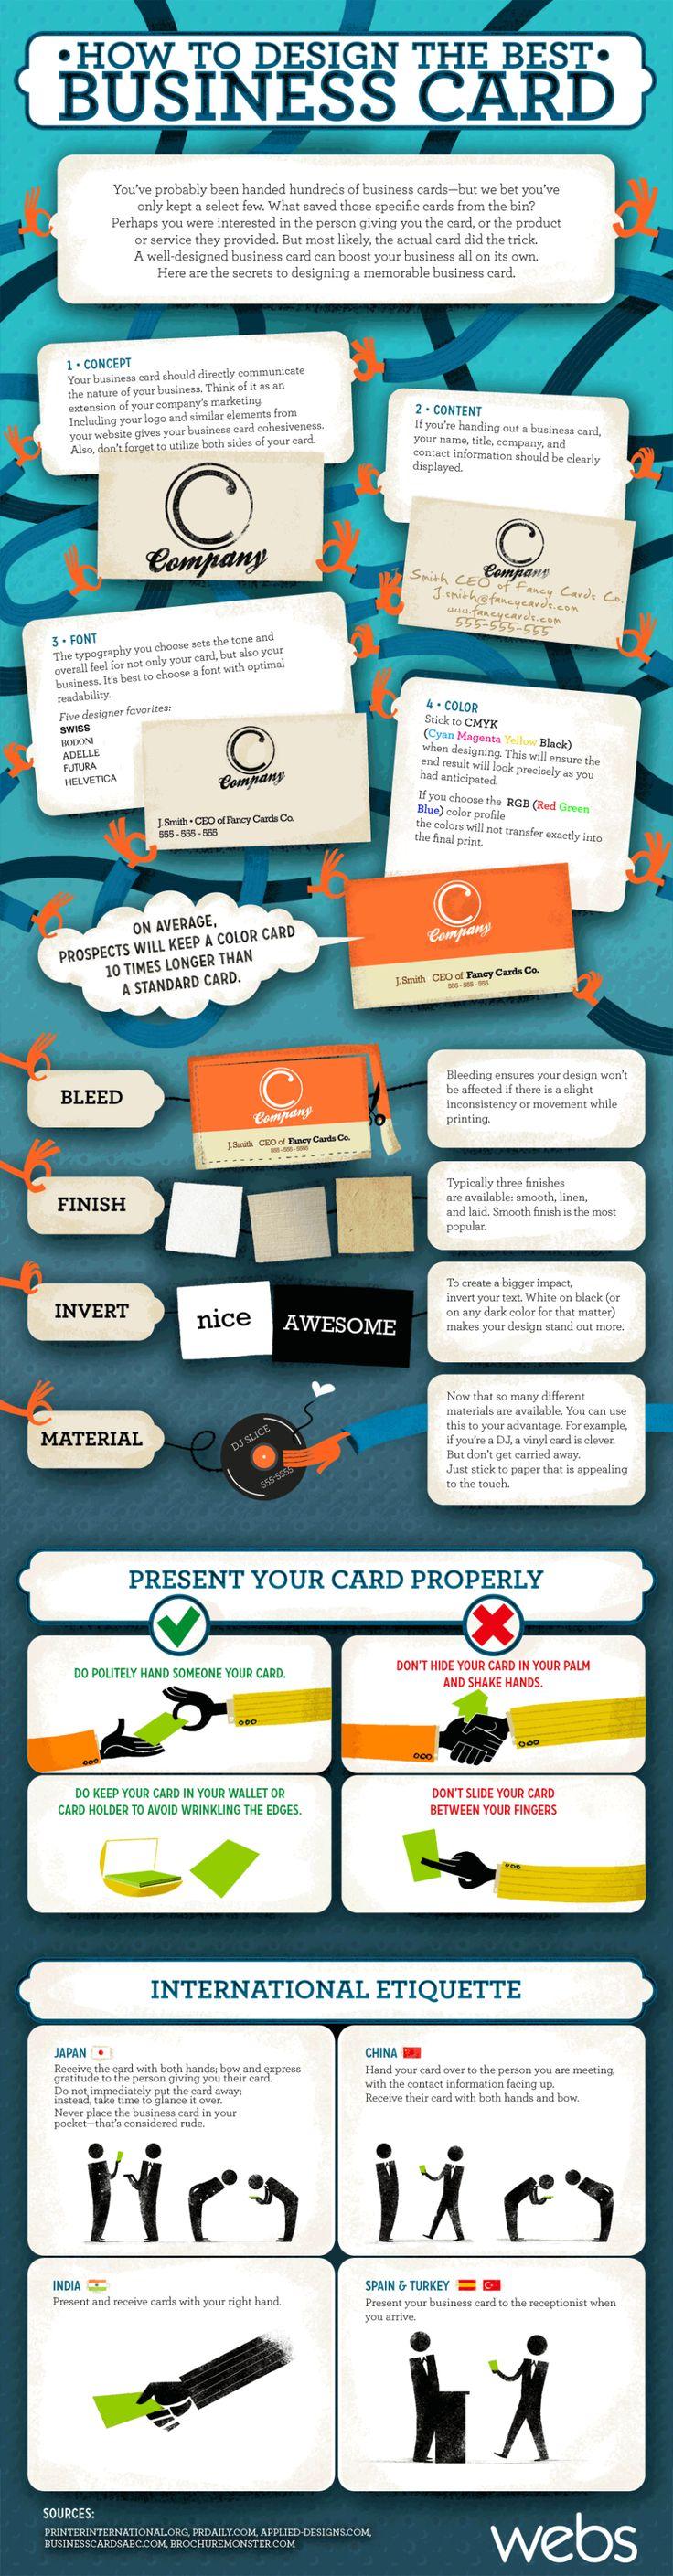 How To Design The Best Business Card | #Infographic via @BizITTrainingAZ